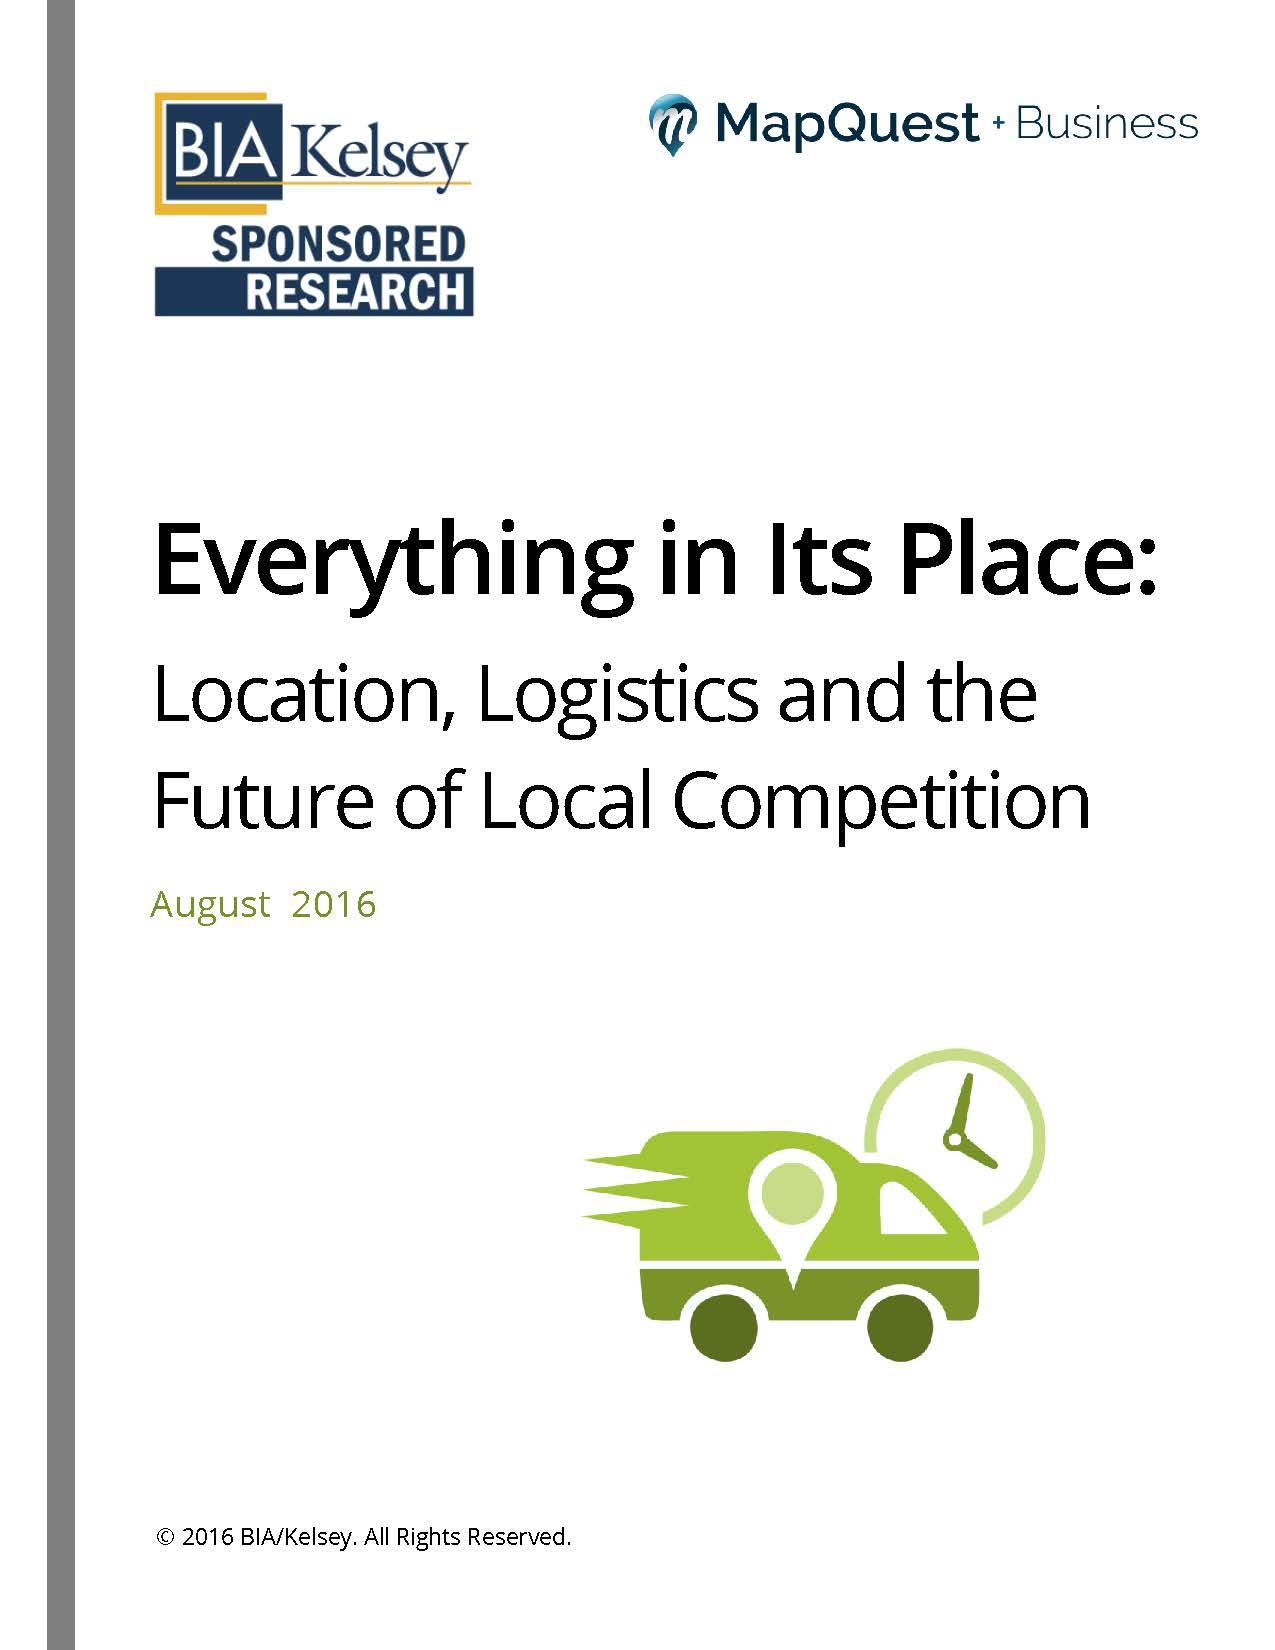 BIAKSponsoredResearch-Mapquest-LocationLogistics-COVER